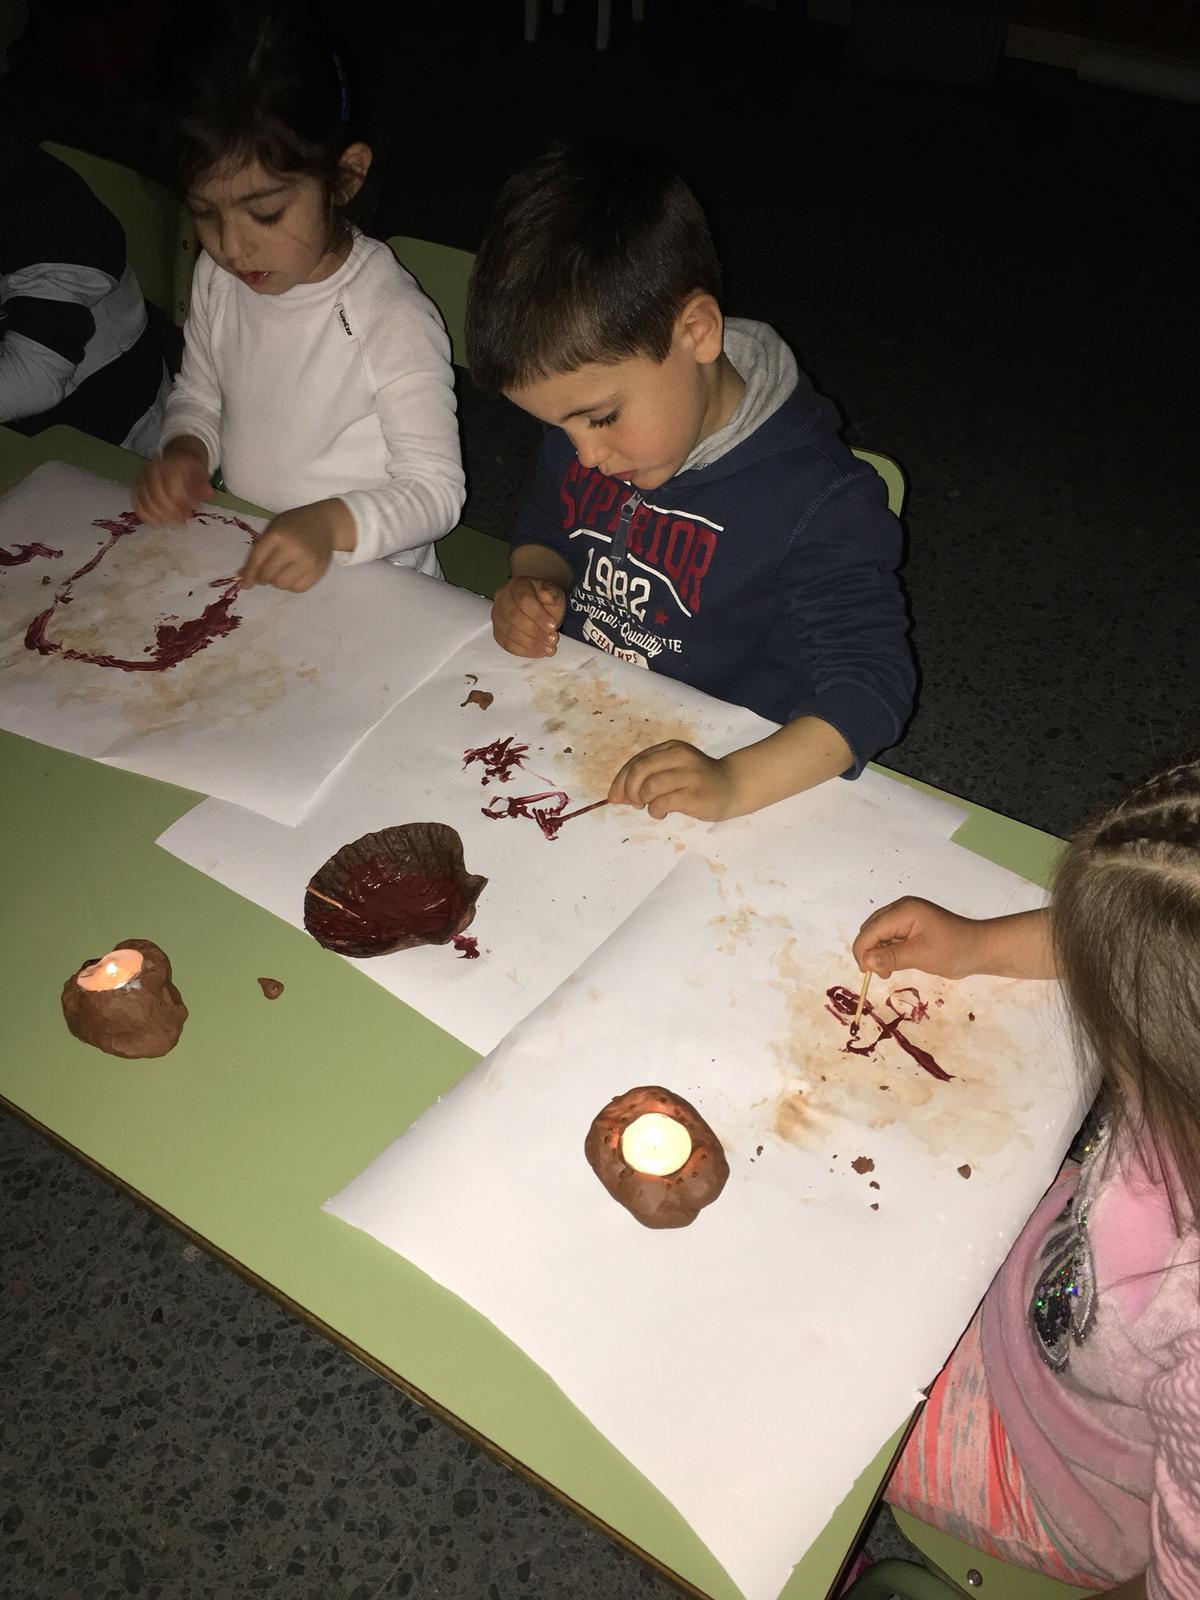 2019_03_15_Infantil 4B descubre la pintura rupestre_CEIP FDLR_Las Rozas 8